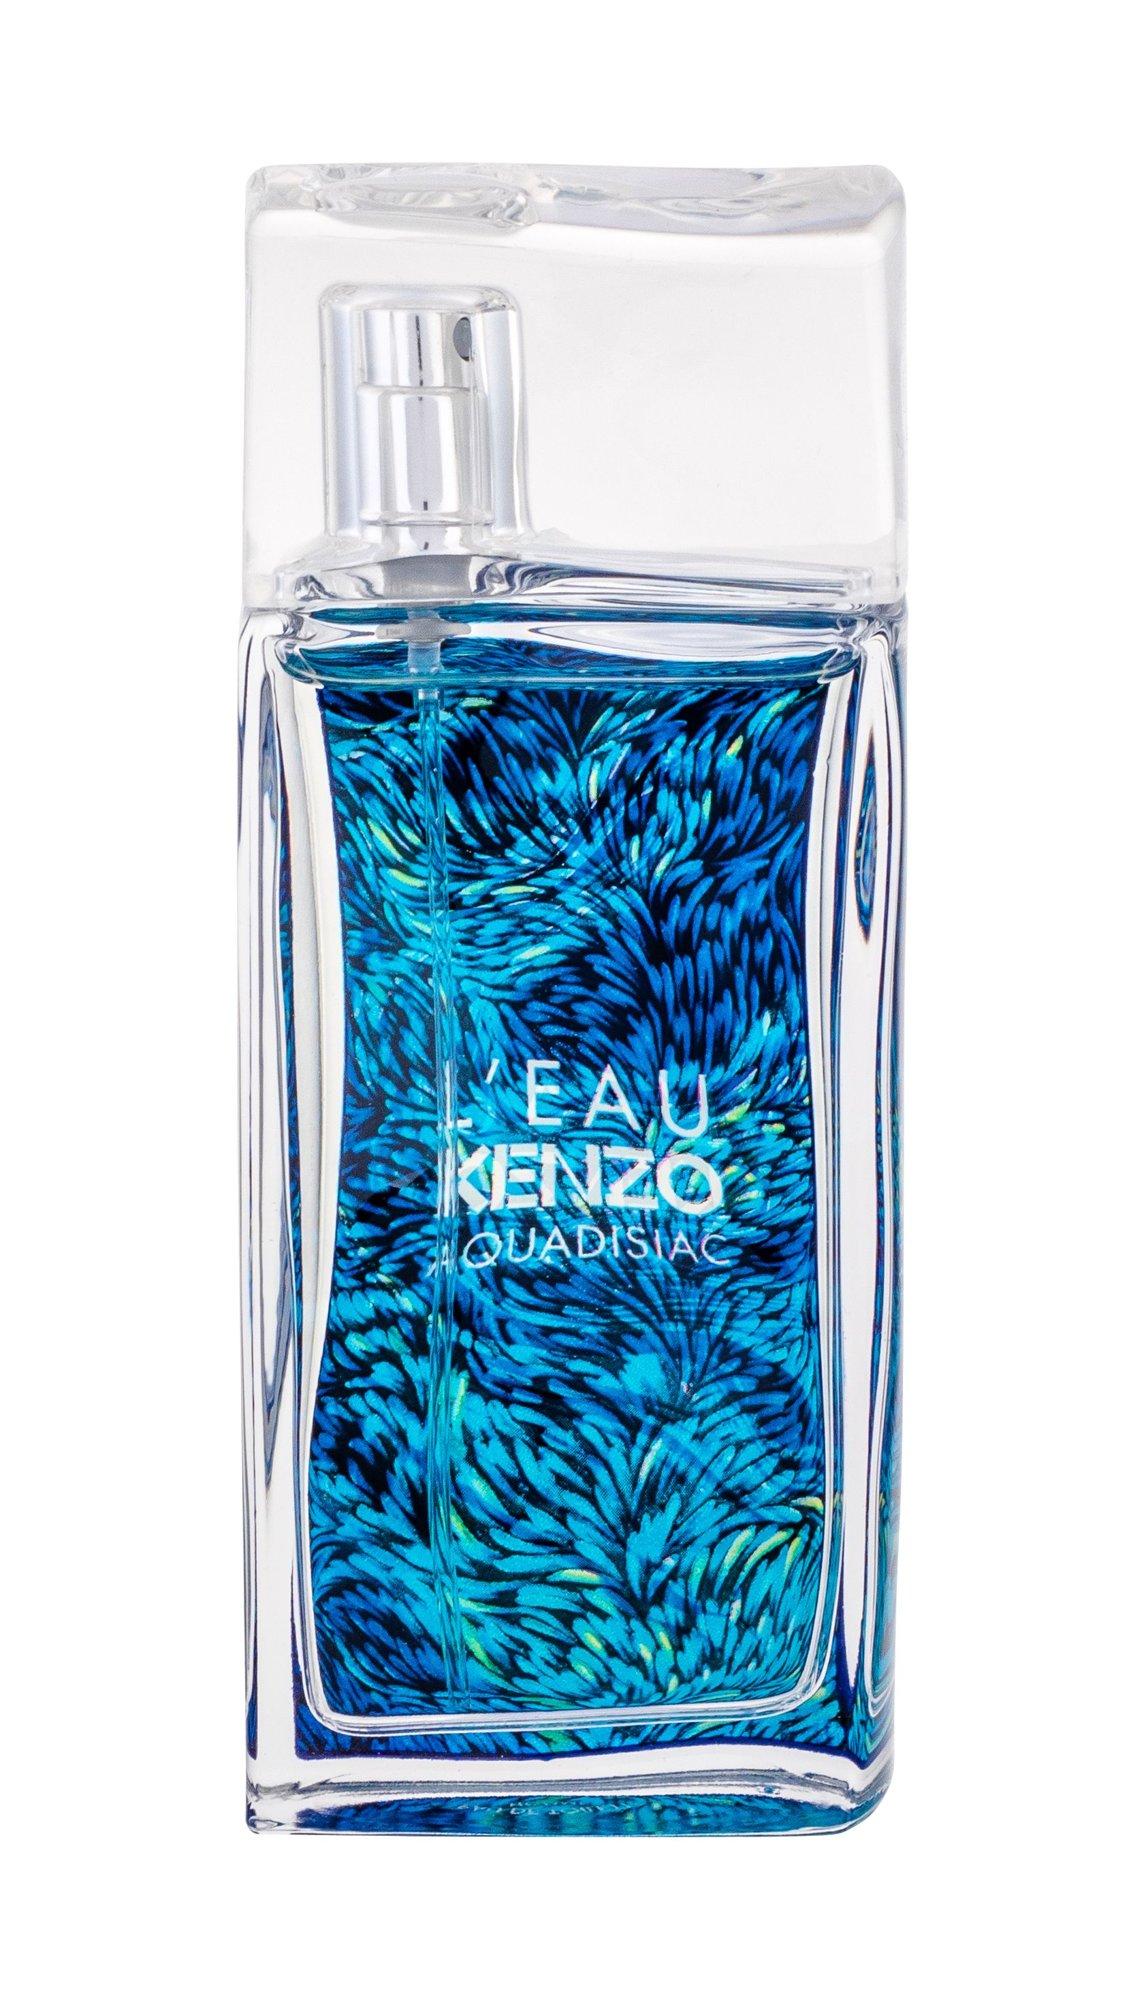 KENZO L´Eau Kenzo Aquadisiac Eau de Toilette 50ml